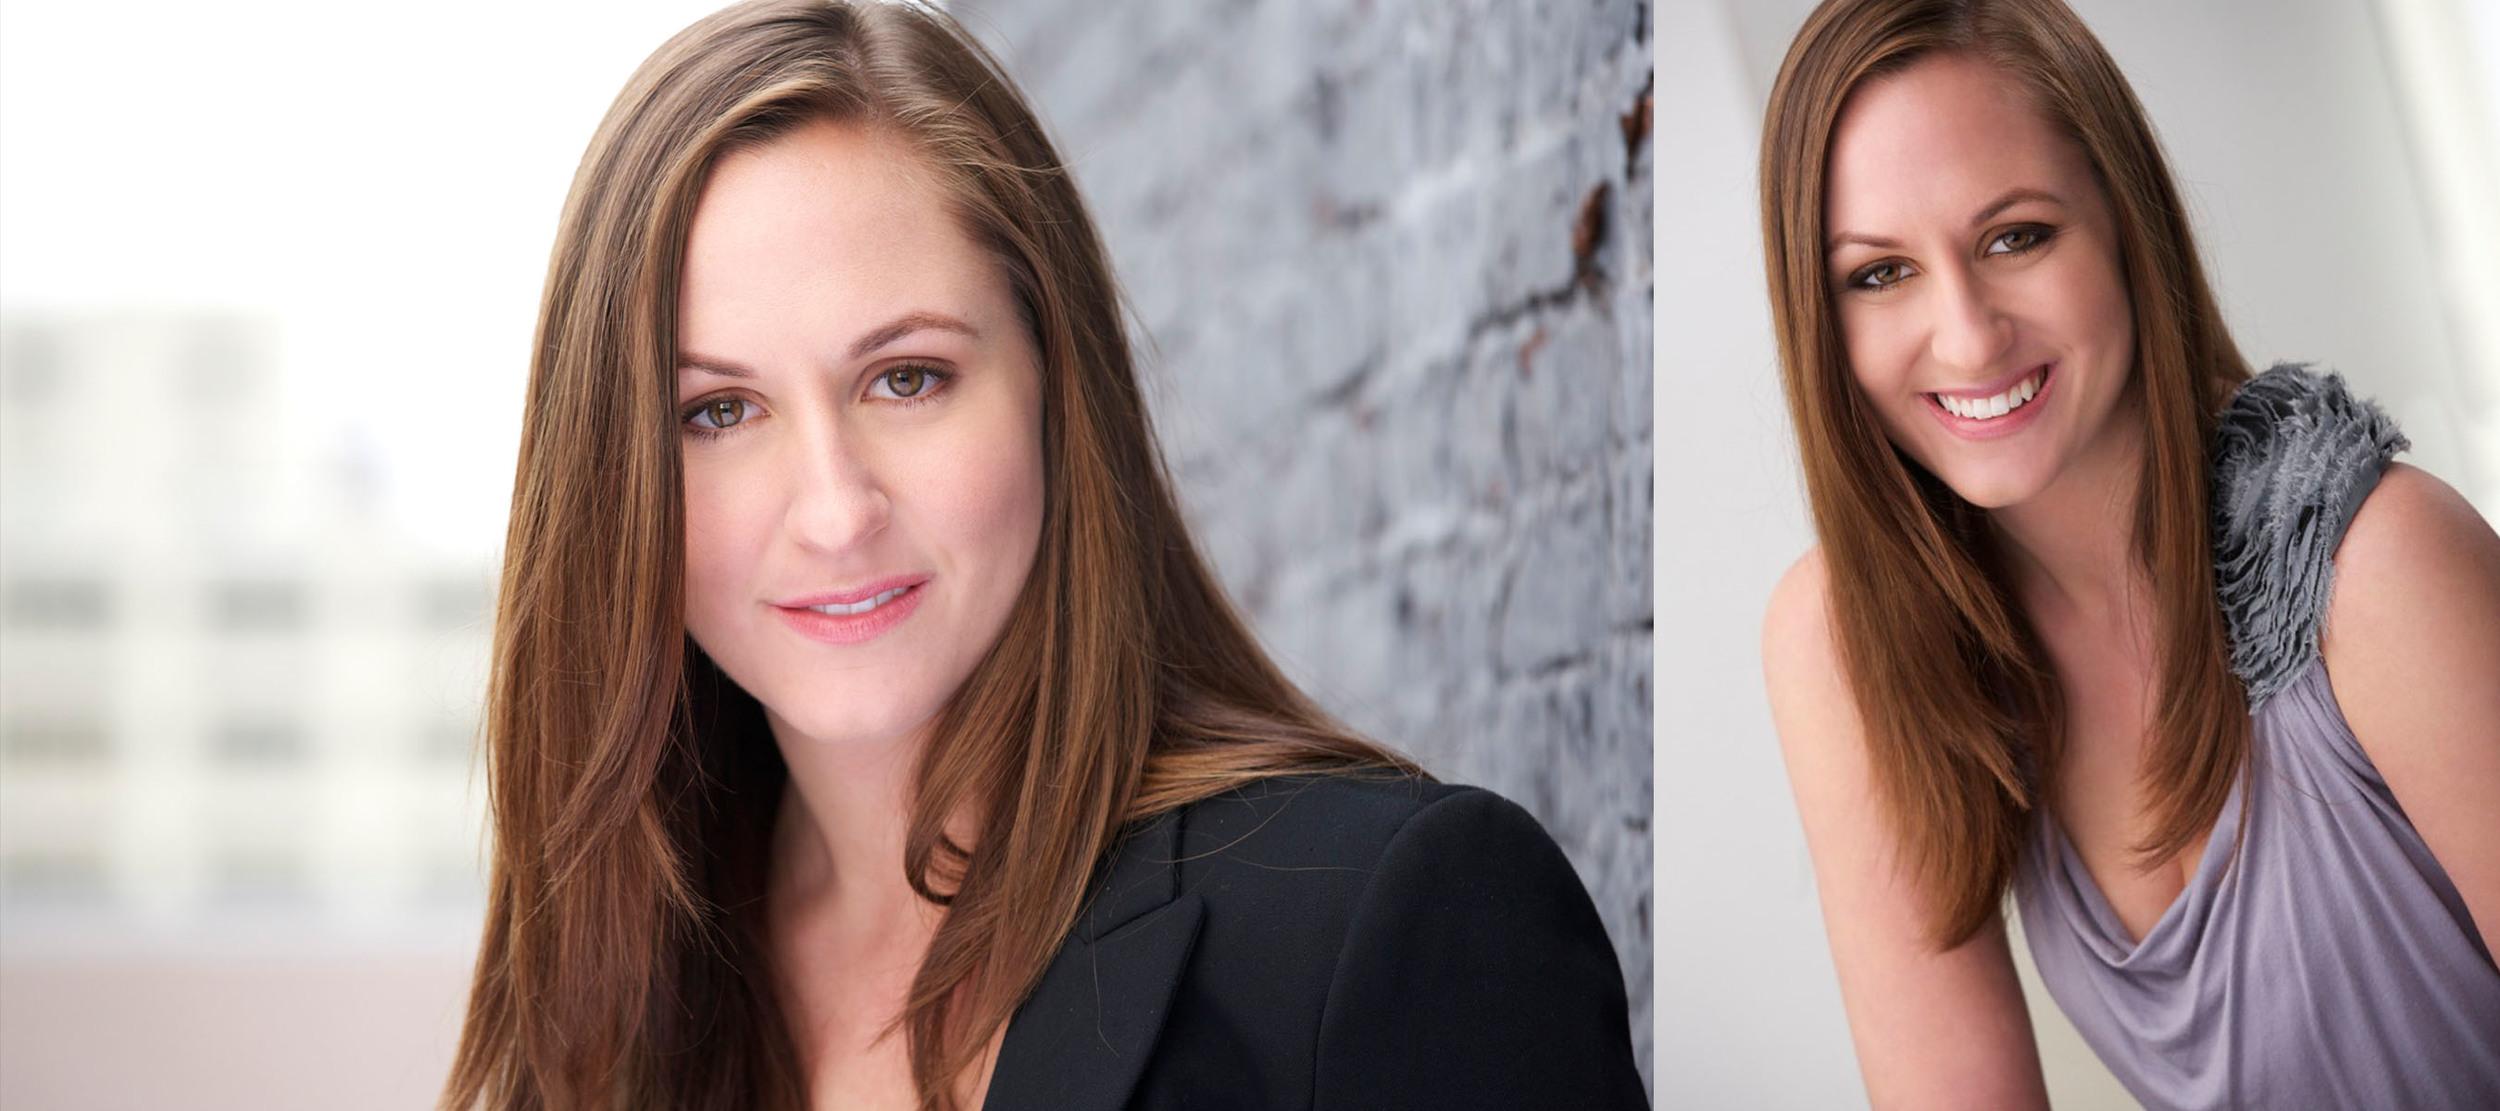 photographer: Brian Offidani makeup: Jodi Formica